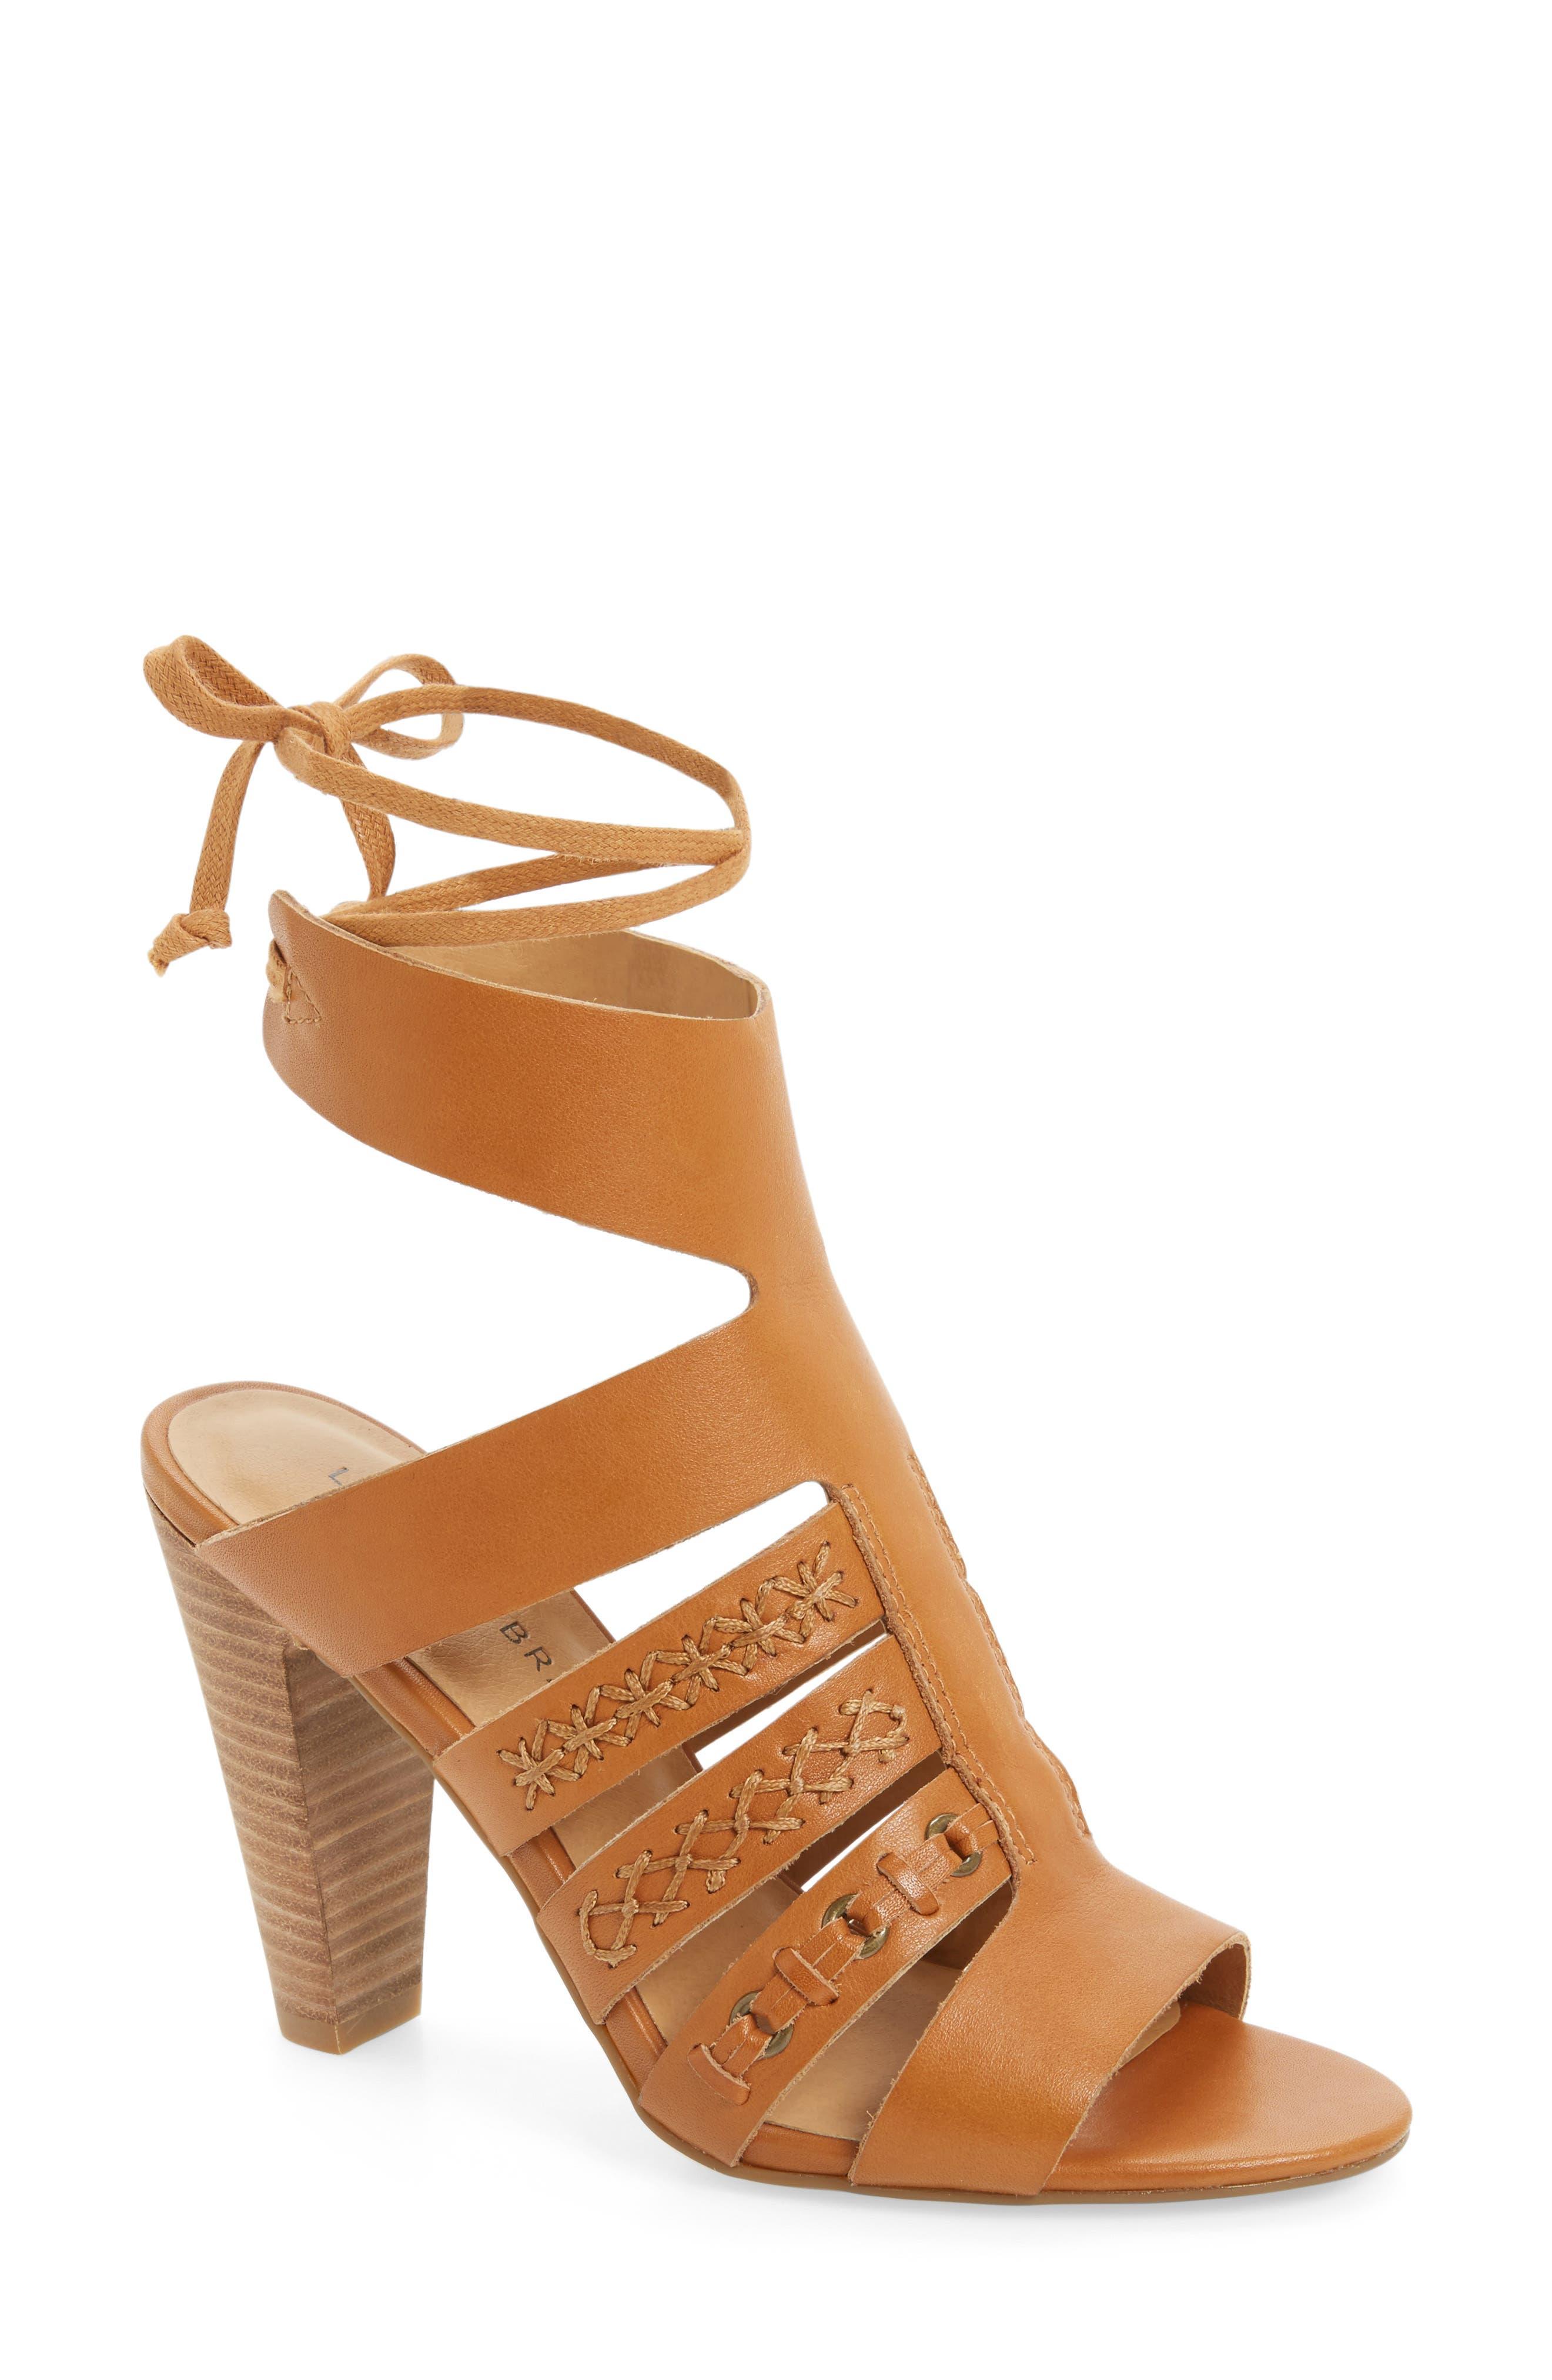 Radfas Lace-Up Sandal,                             Main thumbnail 1, color,                             Cafe Leather